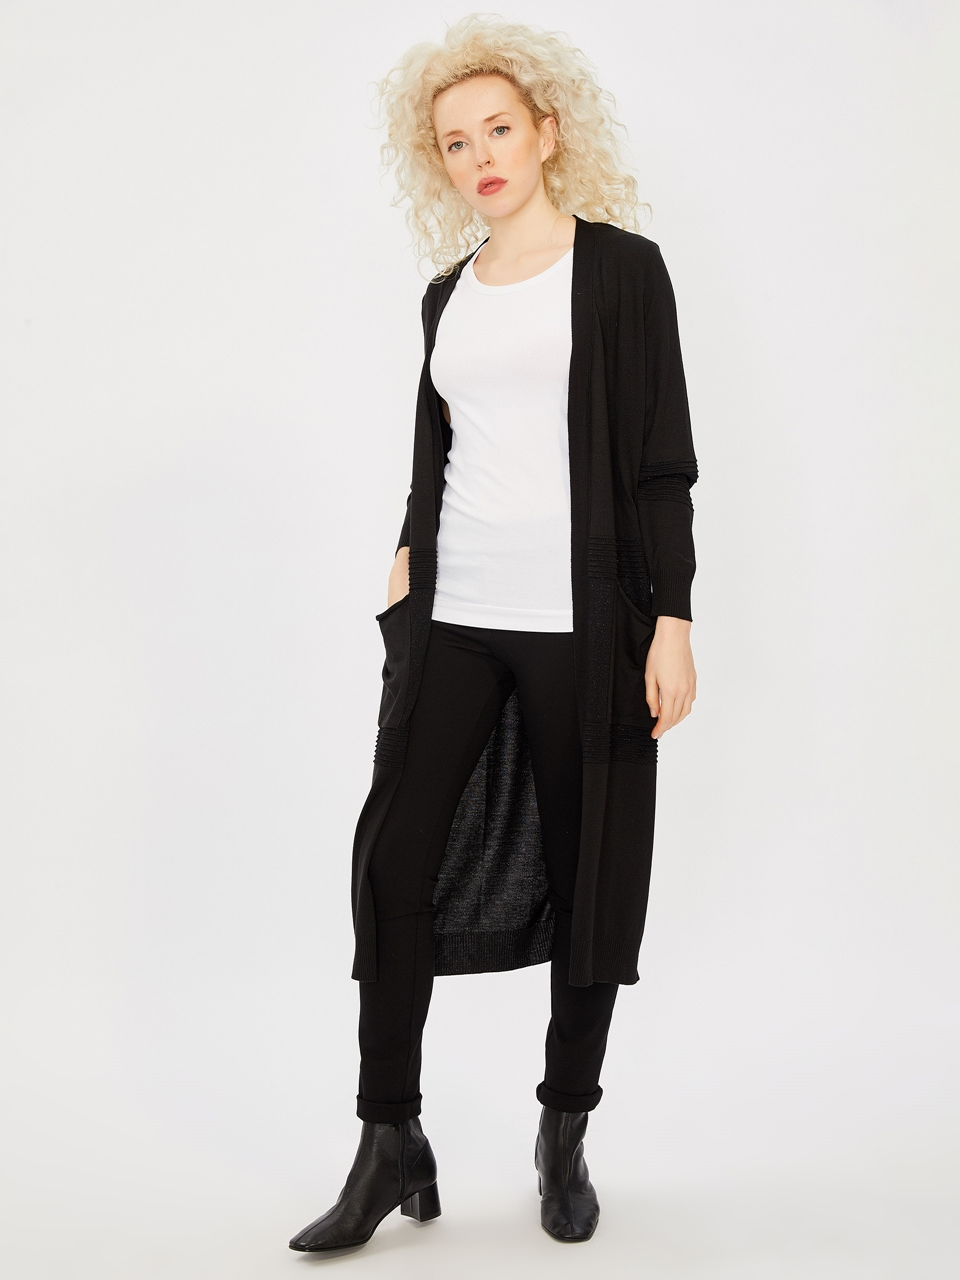 Lurexli Long Knitwear Cardigan